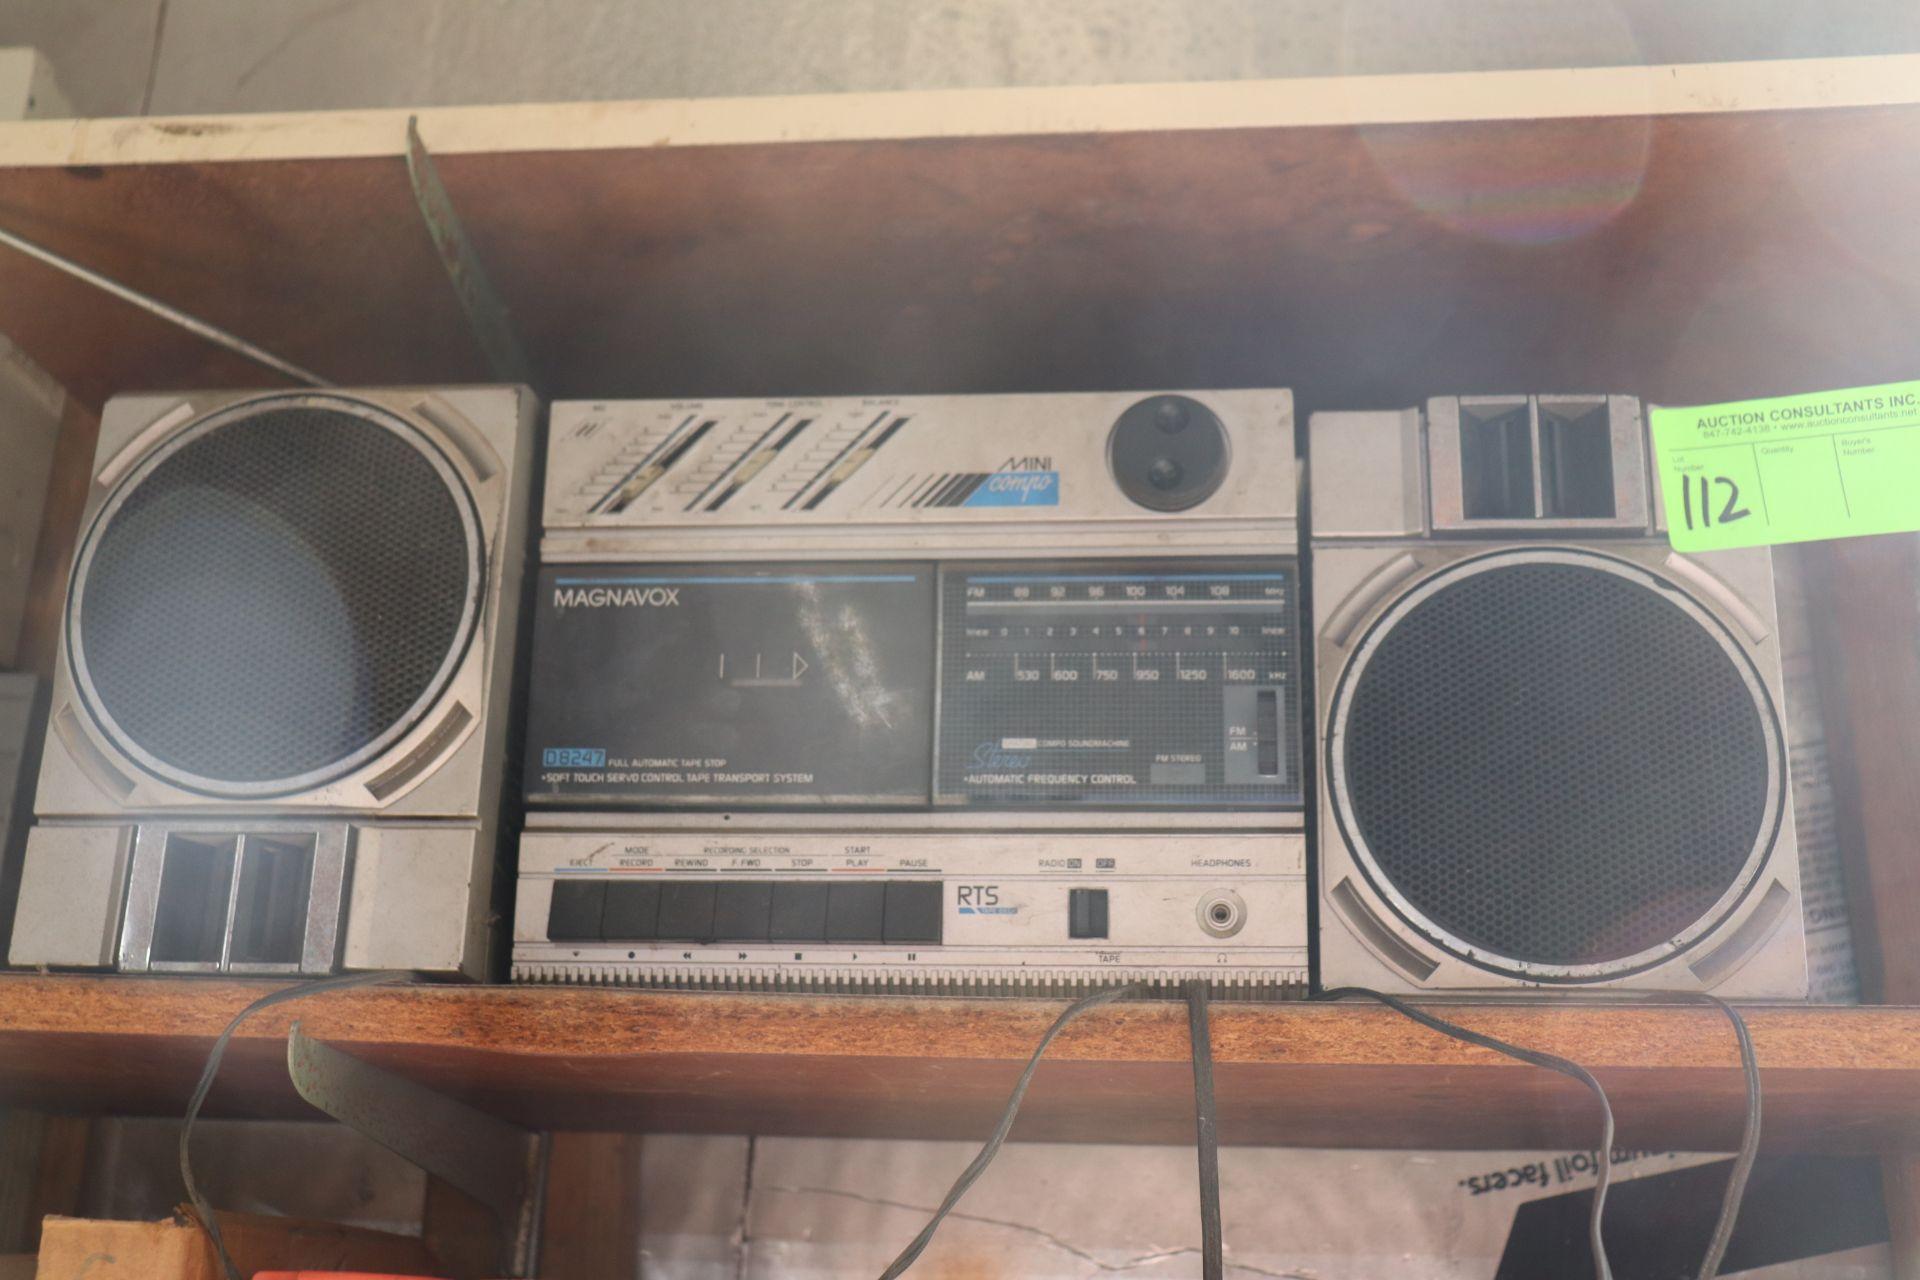 Magnavox Mini Com Pro D8248 stereo system